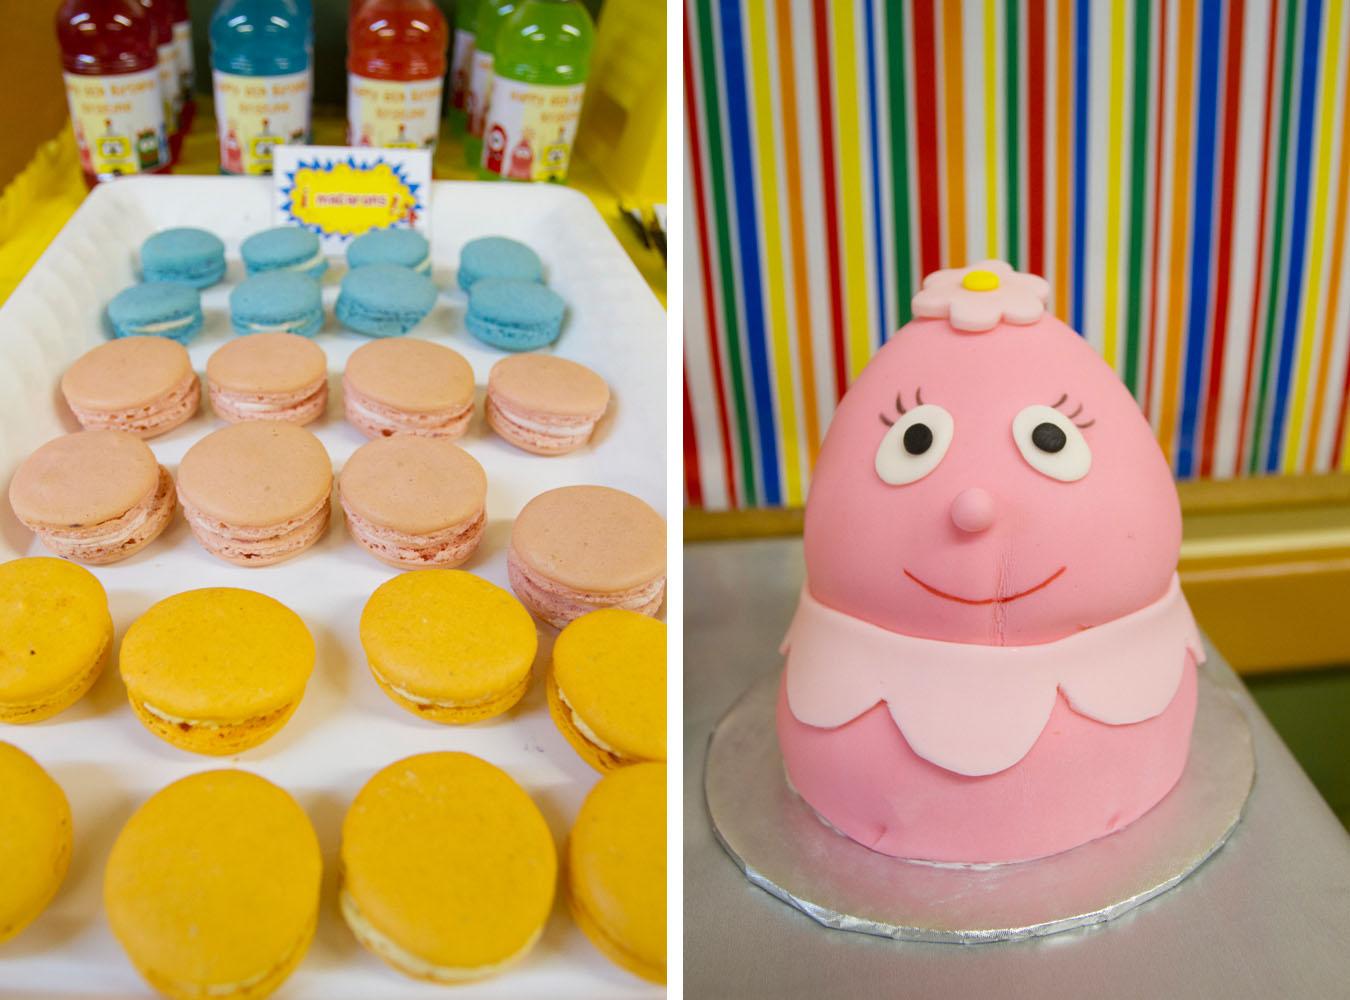 foofa cake and macarons